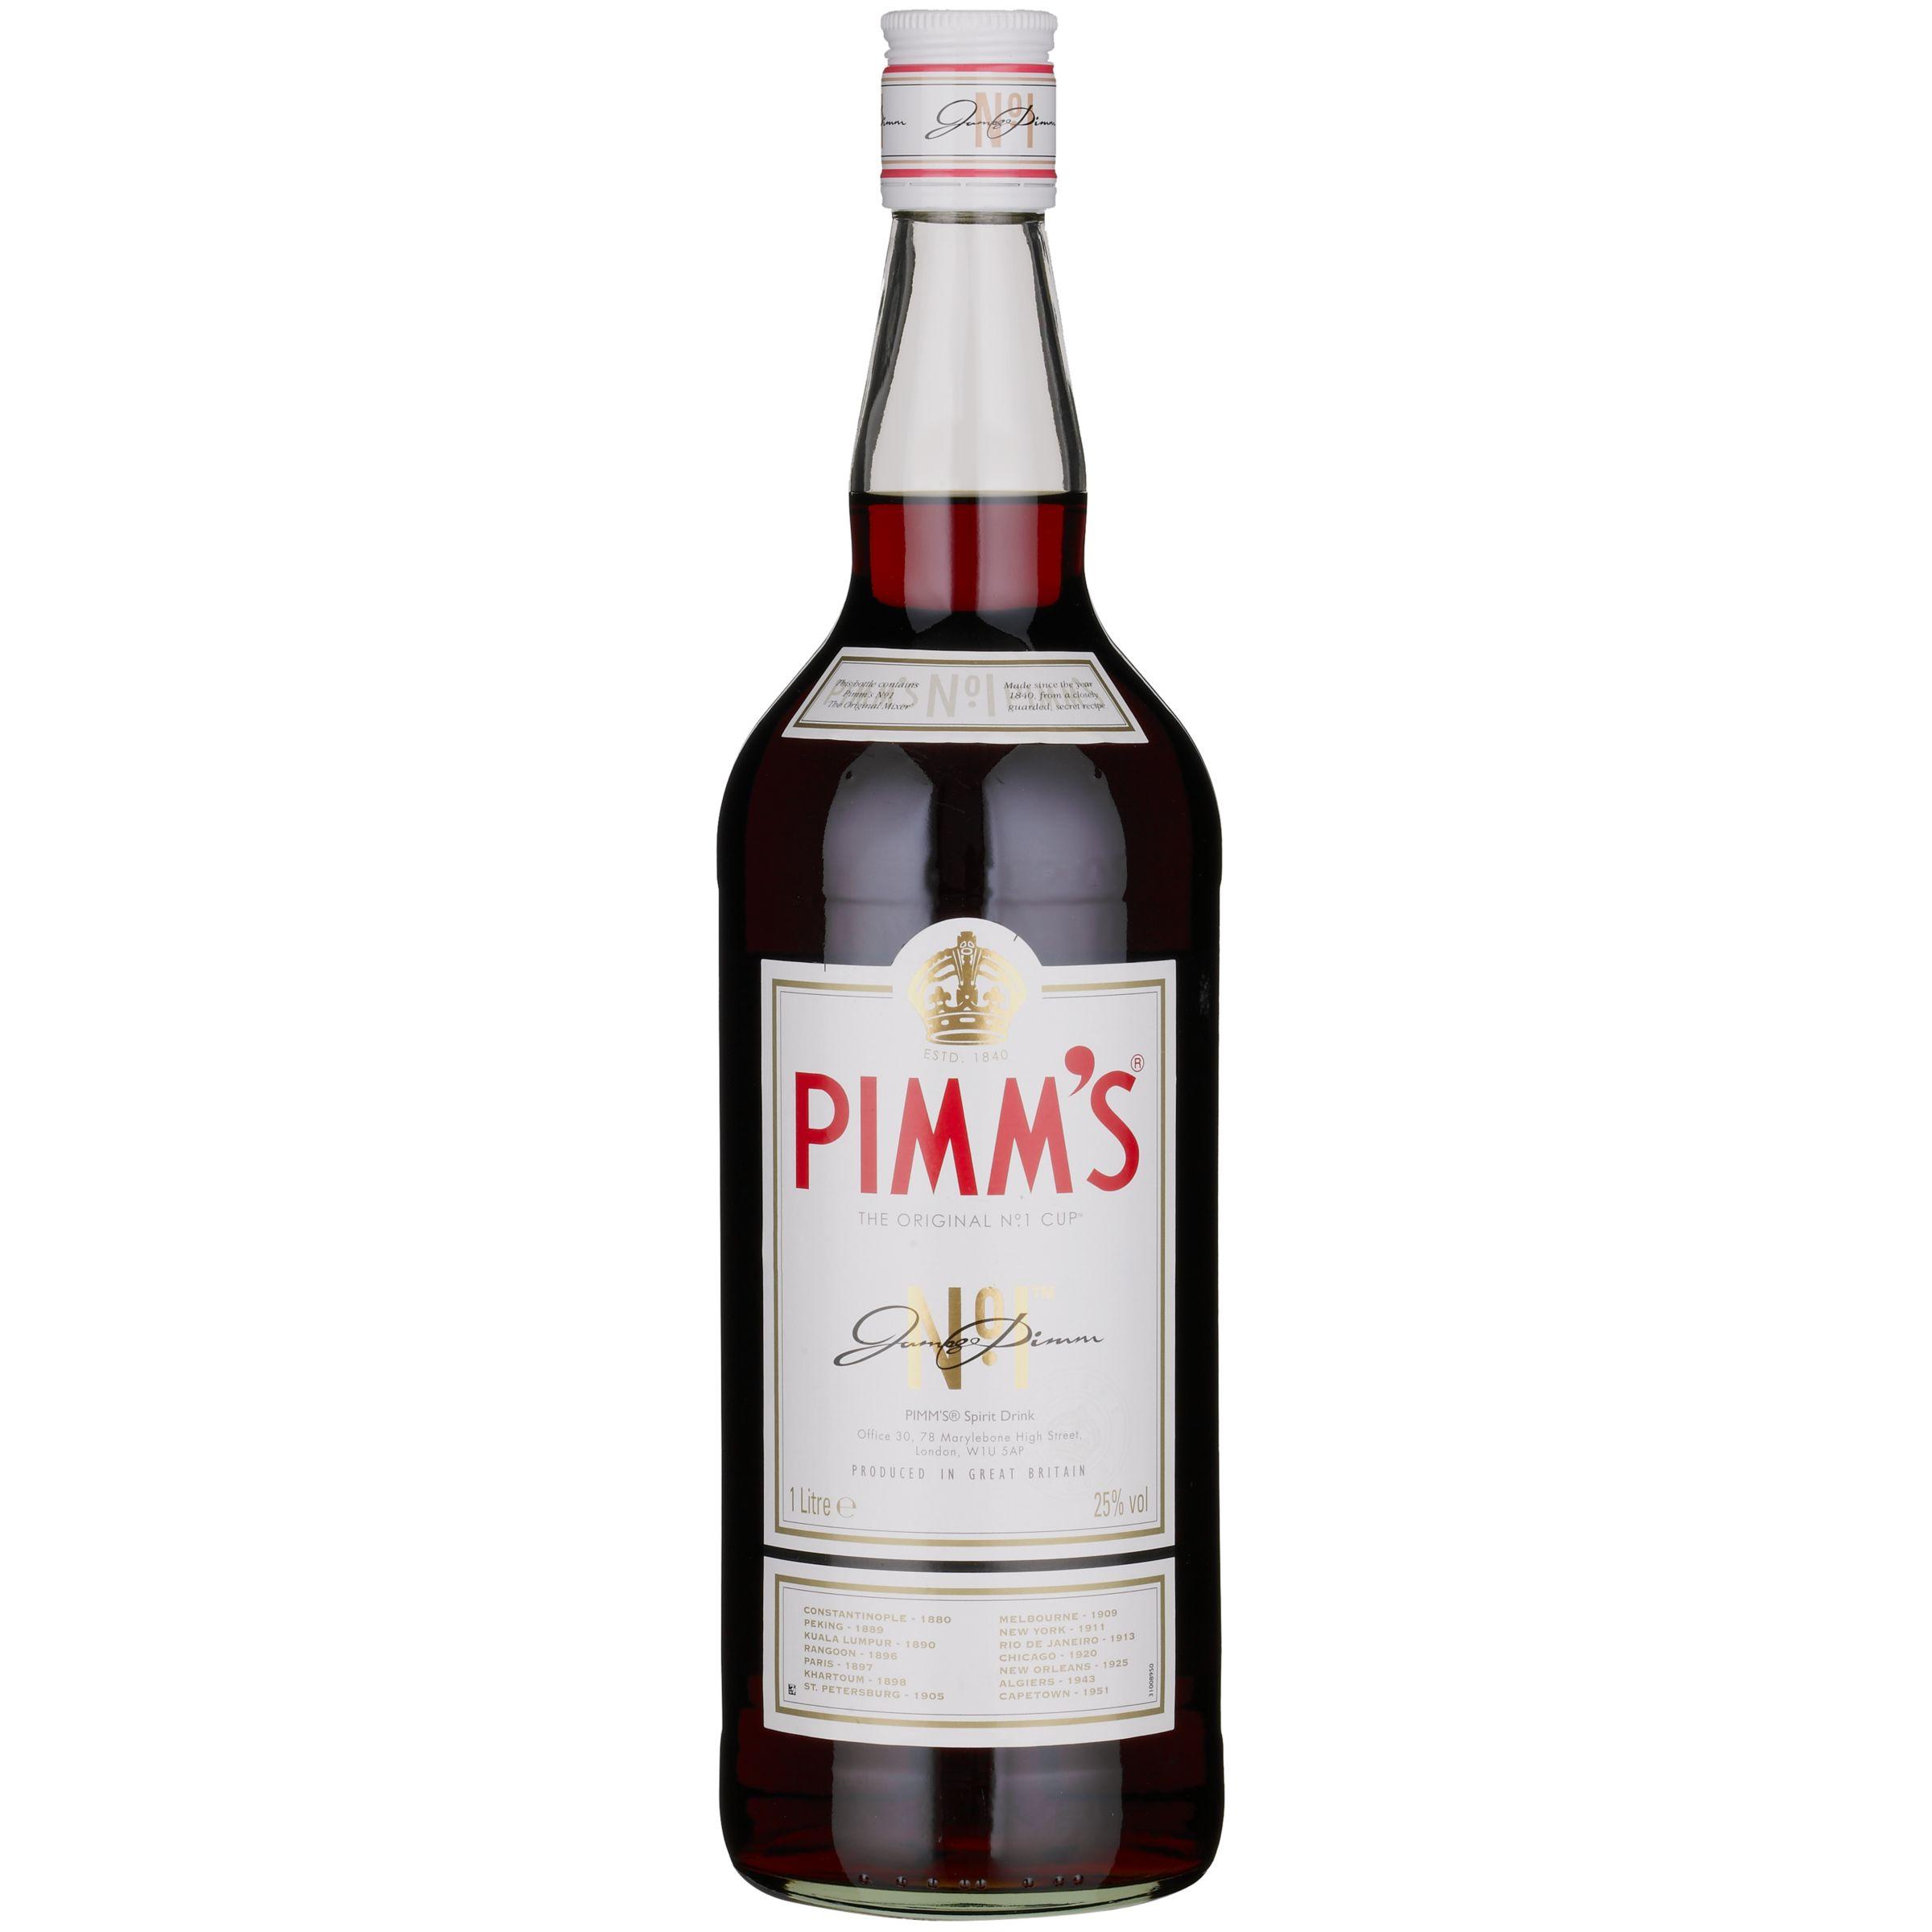 Pimm's No.1 at John Lewis